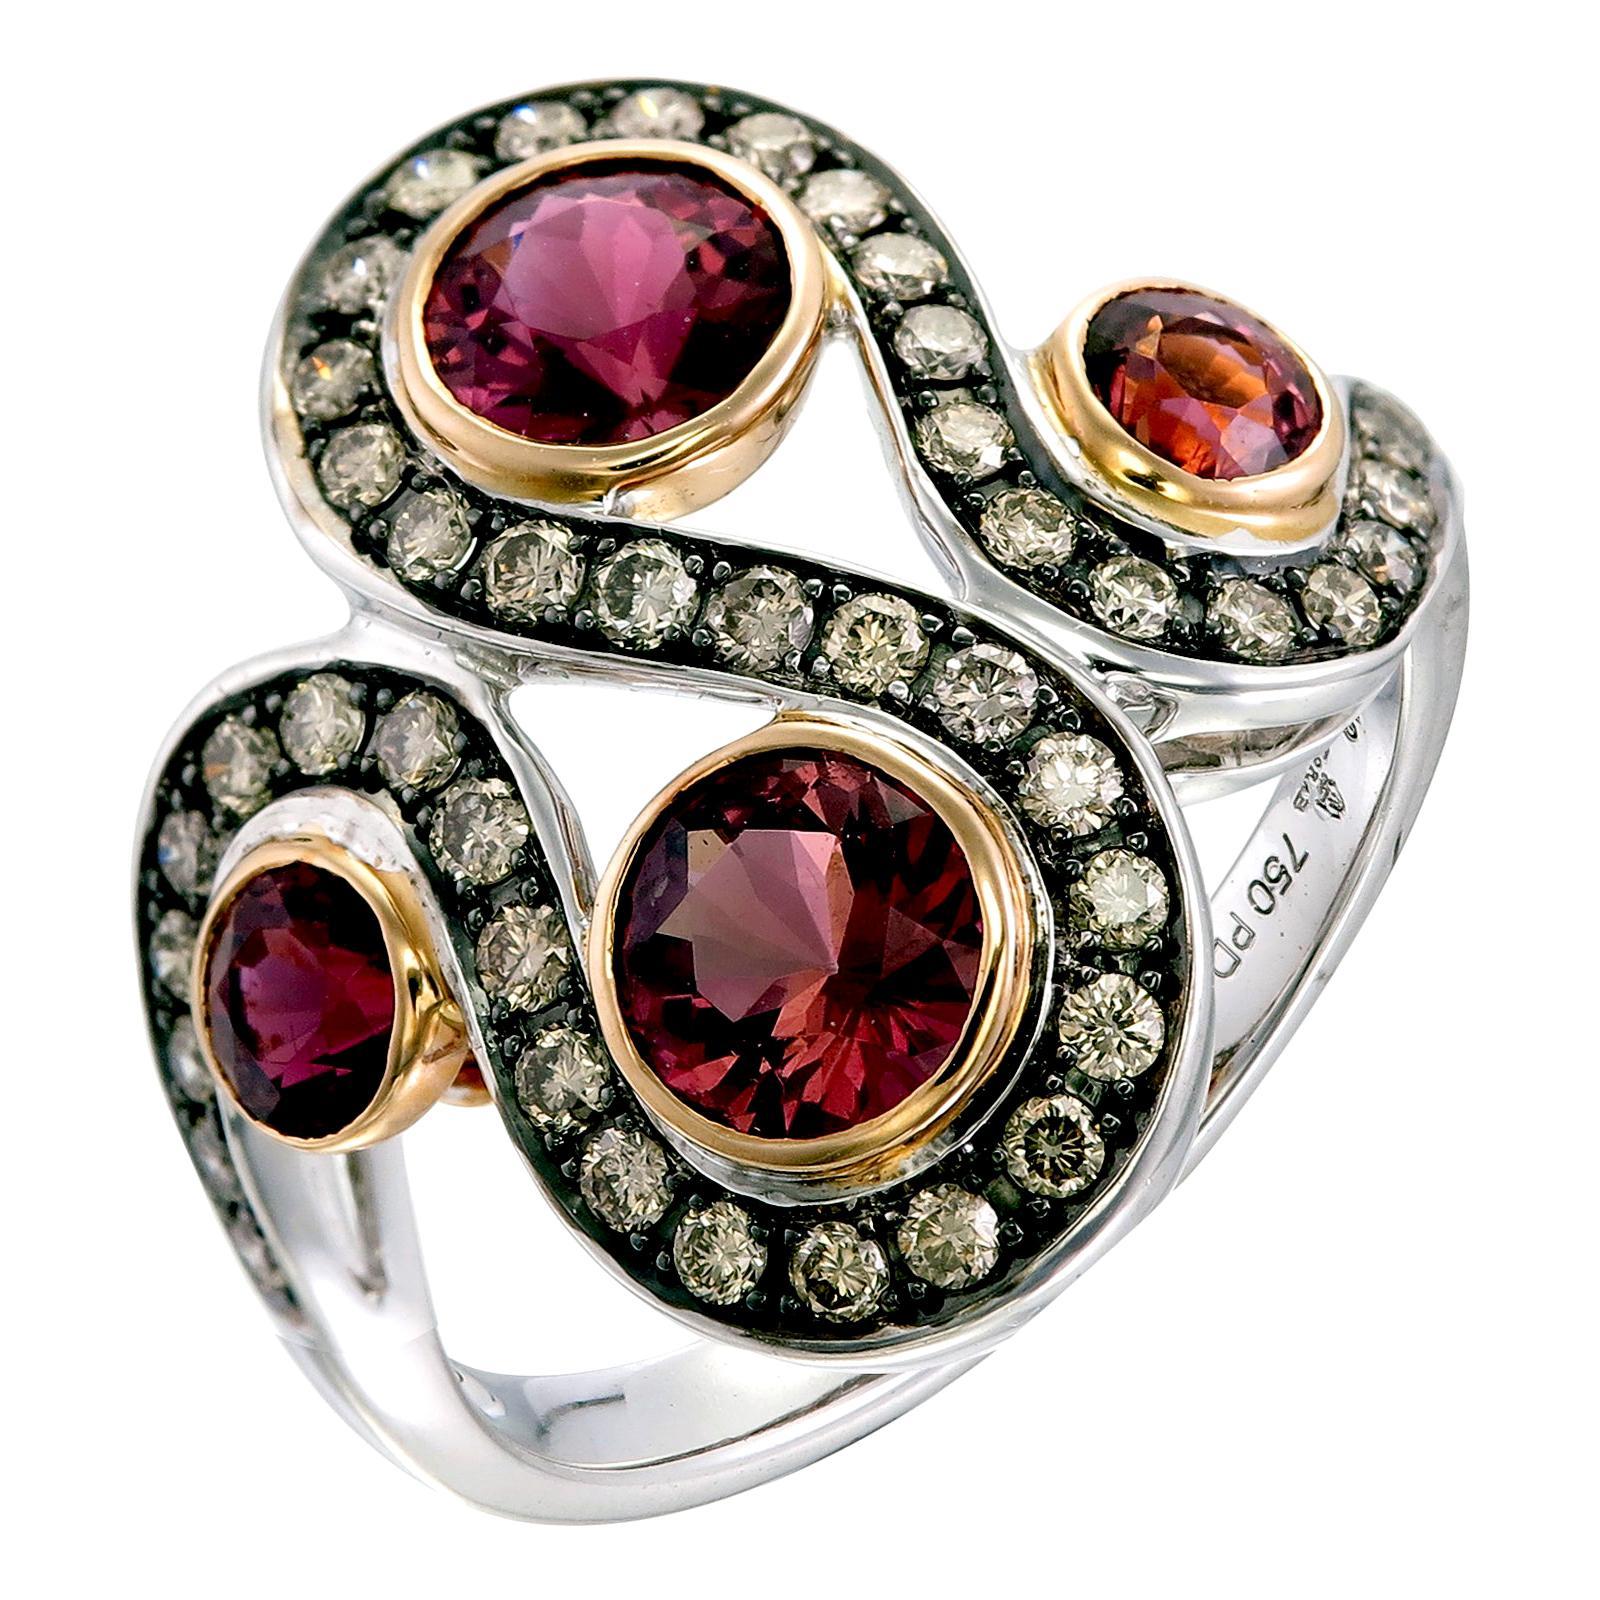 Zorab Creation The Serpent Pink Tourmaline and Diamond Ring